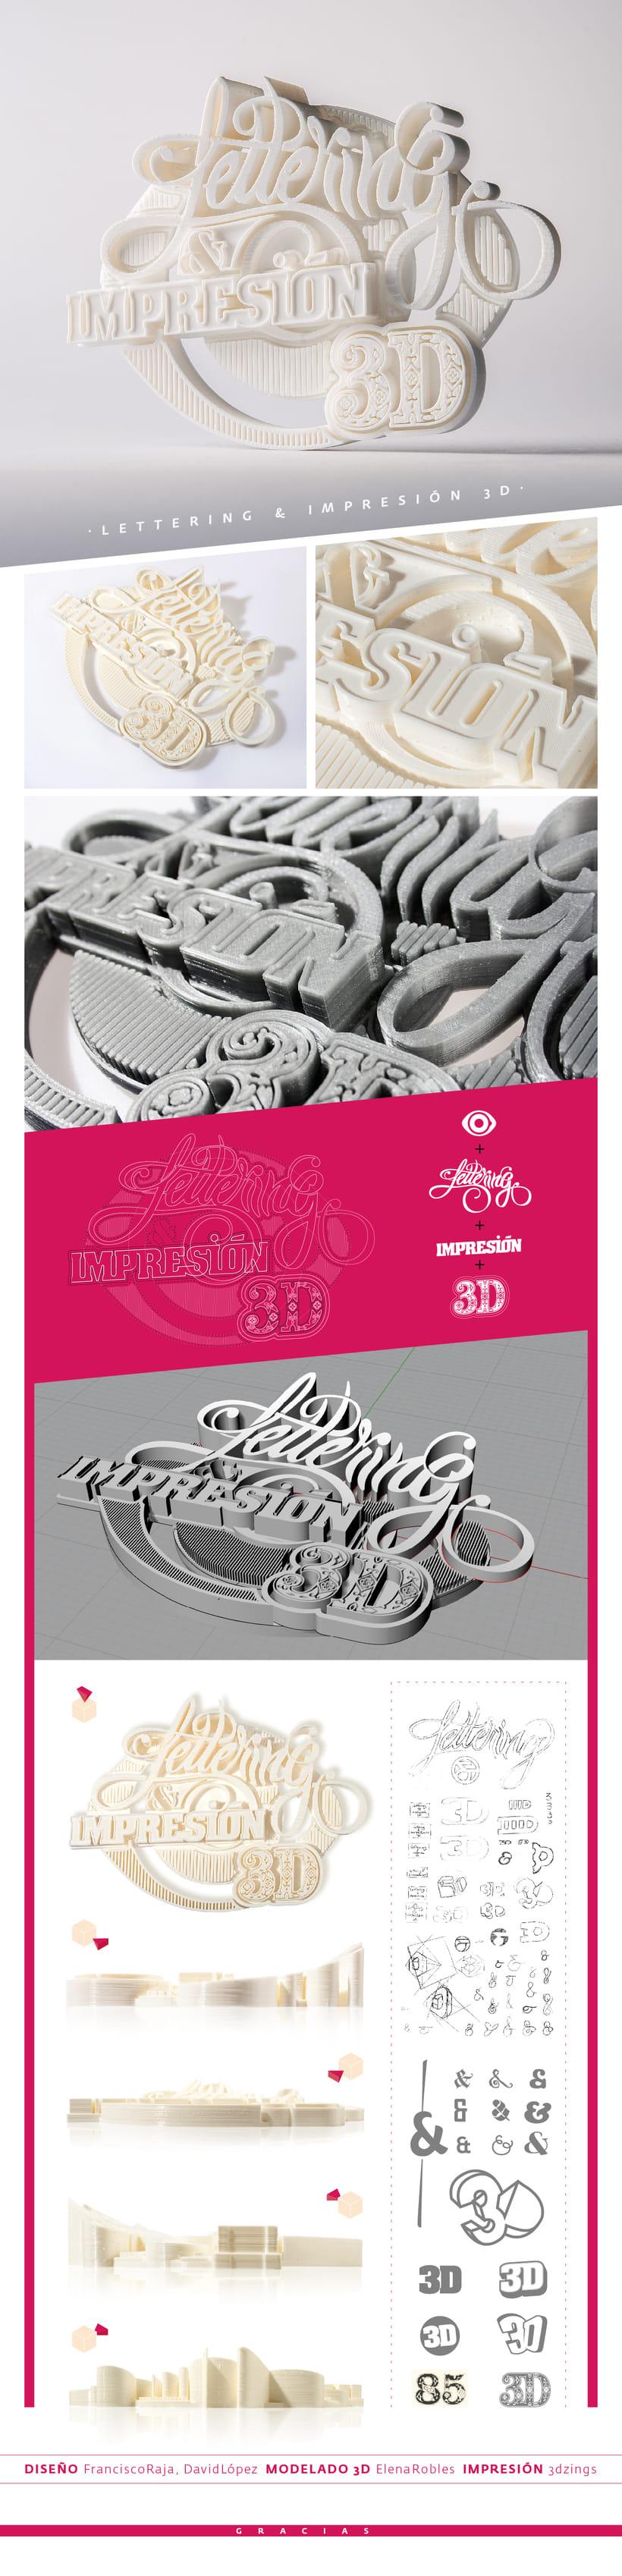 Lettering & impresión 3D 0